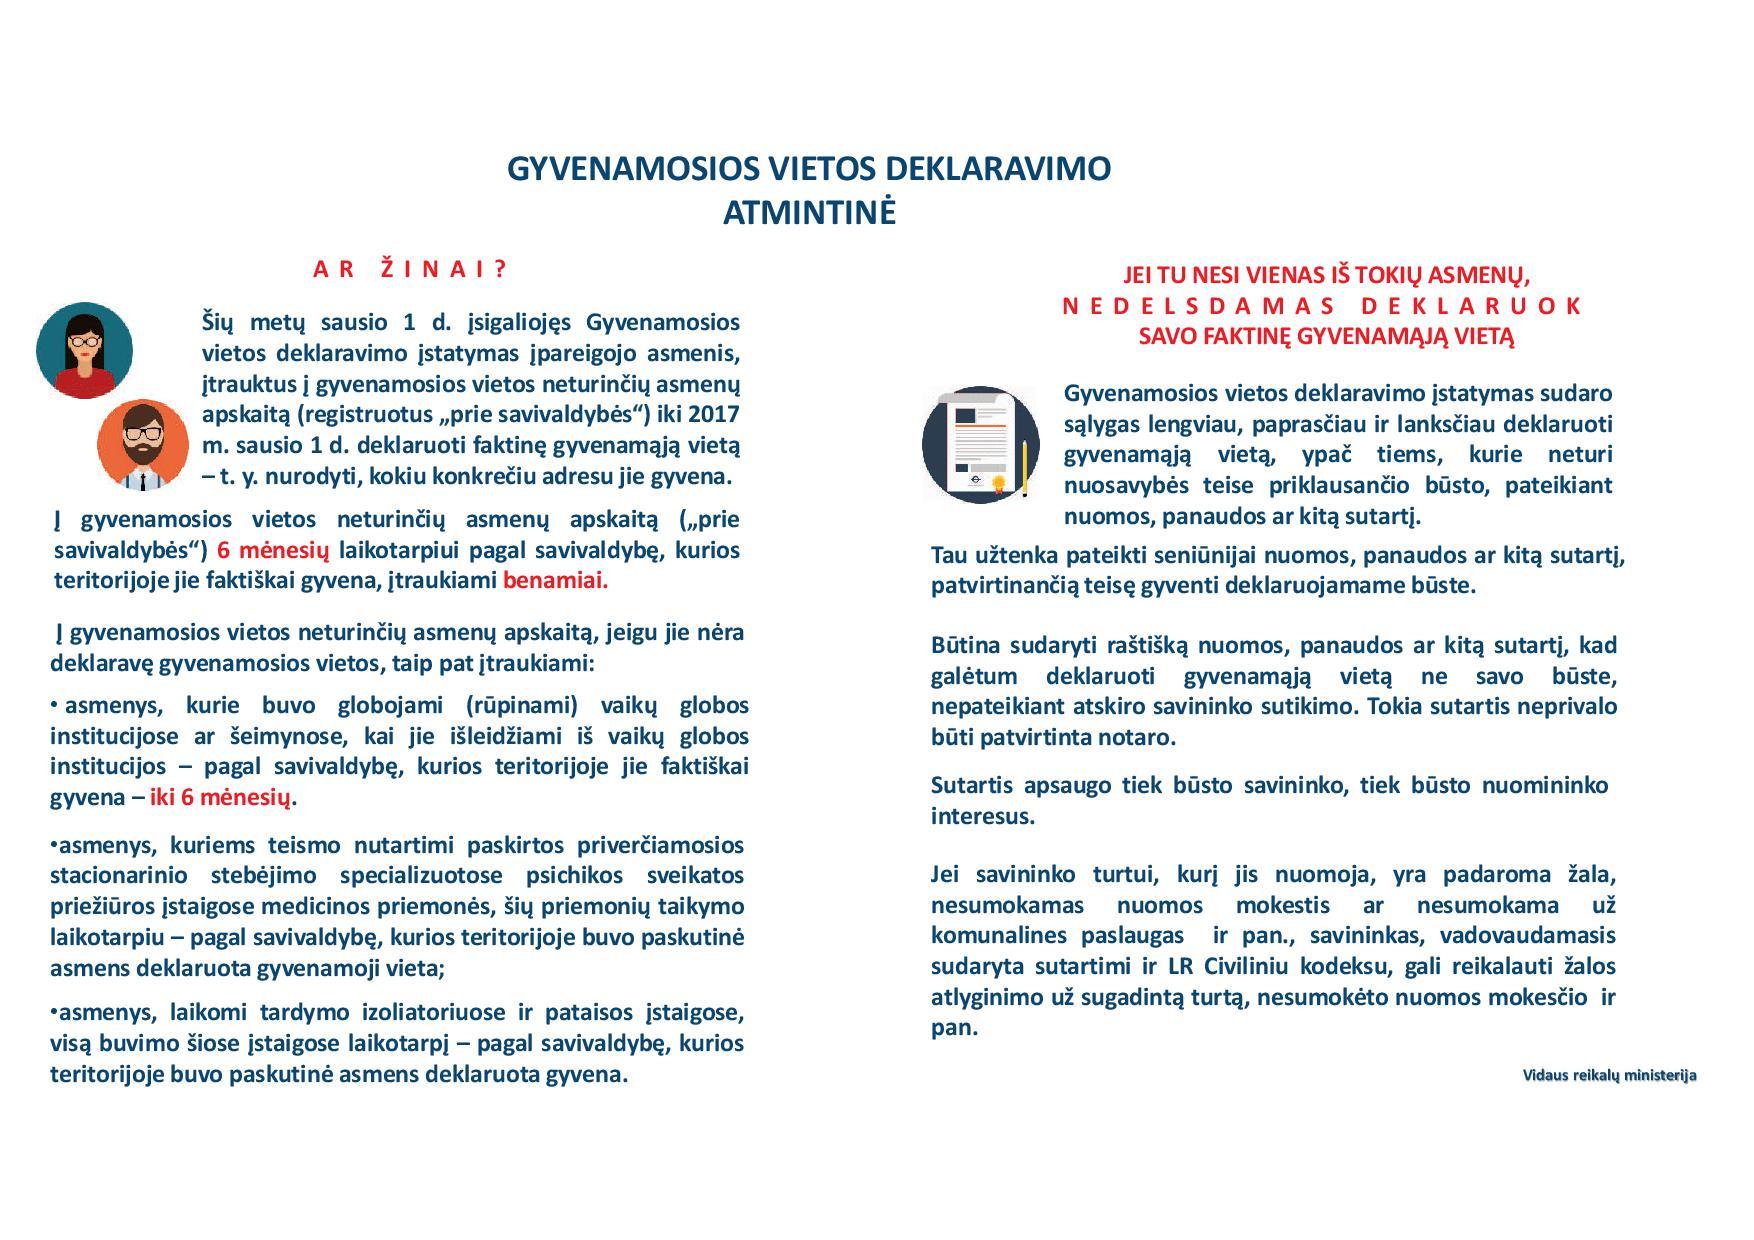 atmintine-del-deklaravimo1